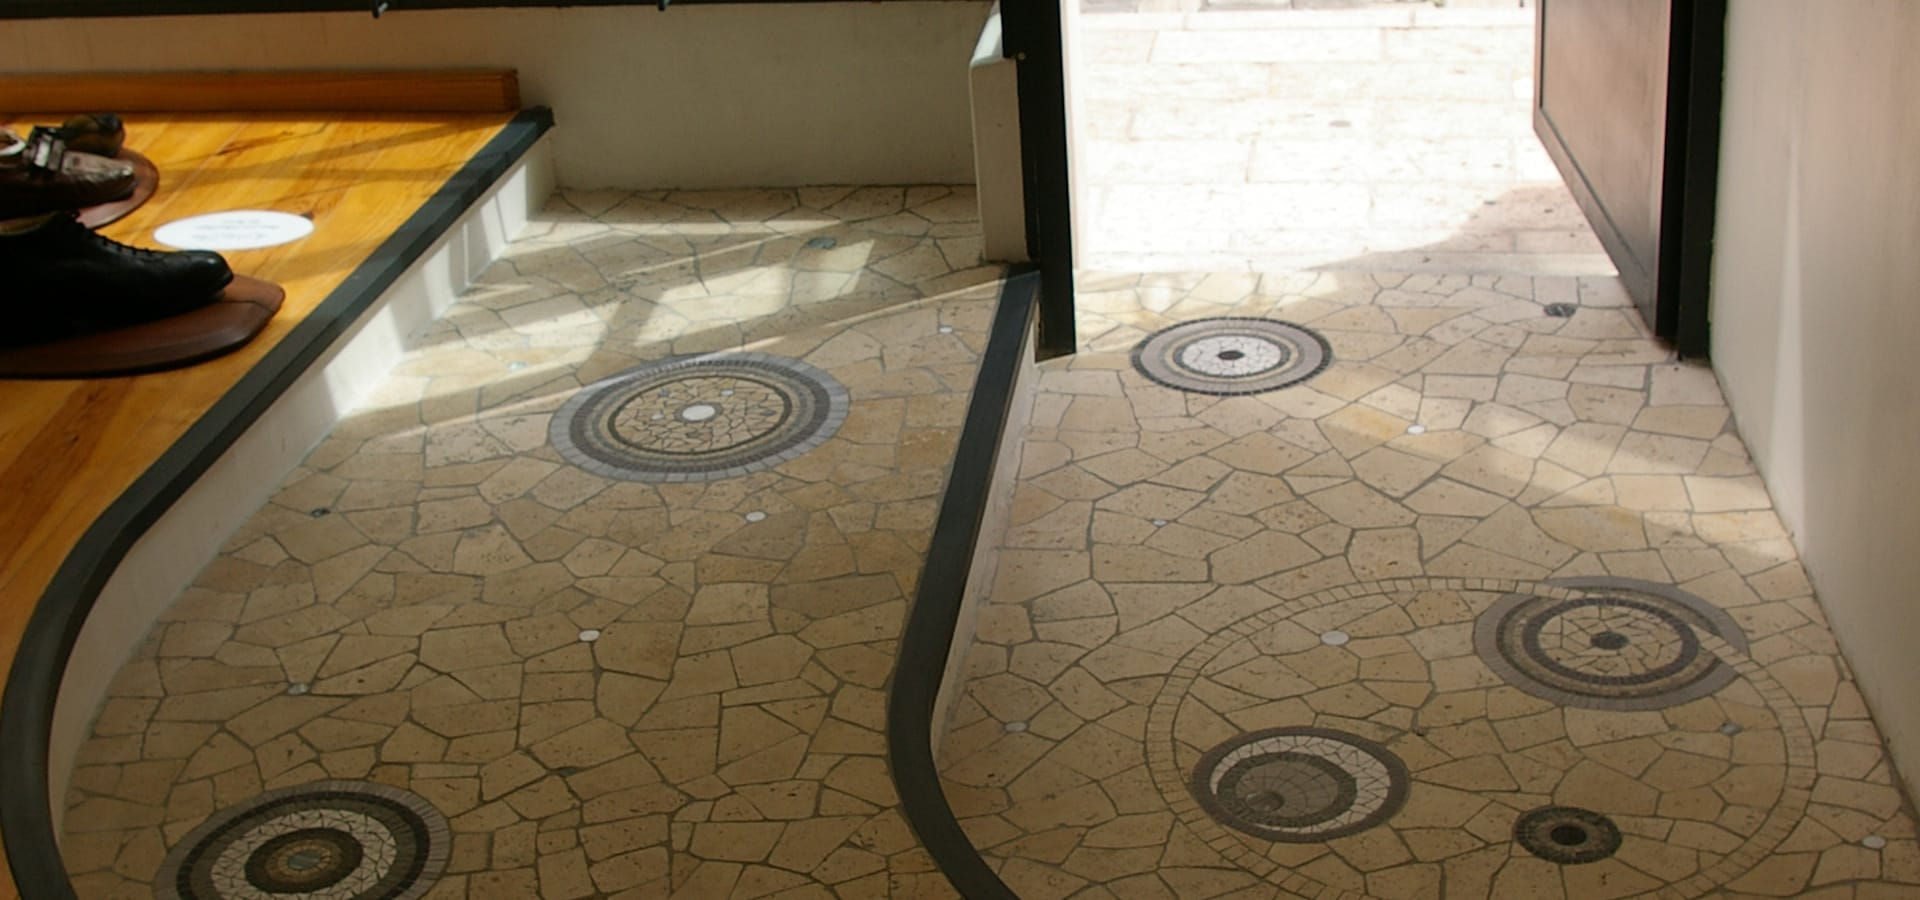 CREDEMO (CREation DEcoration MOsaique